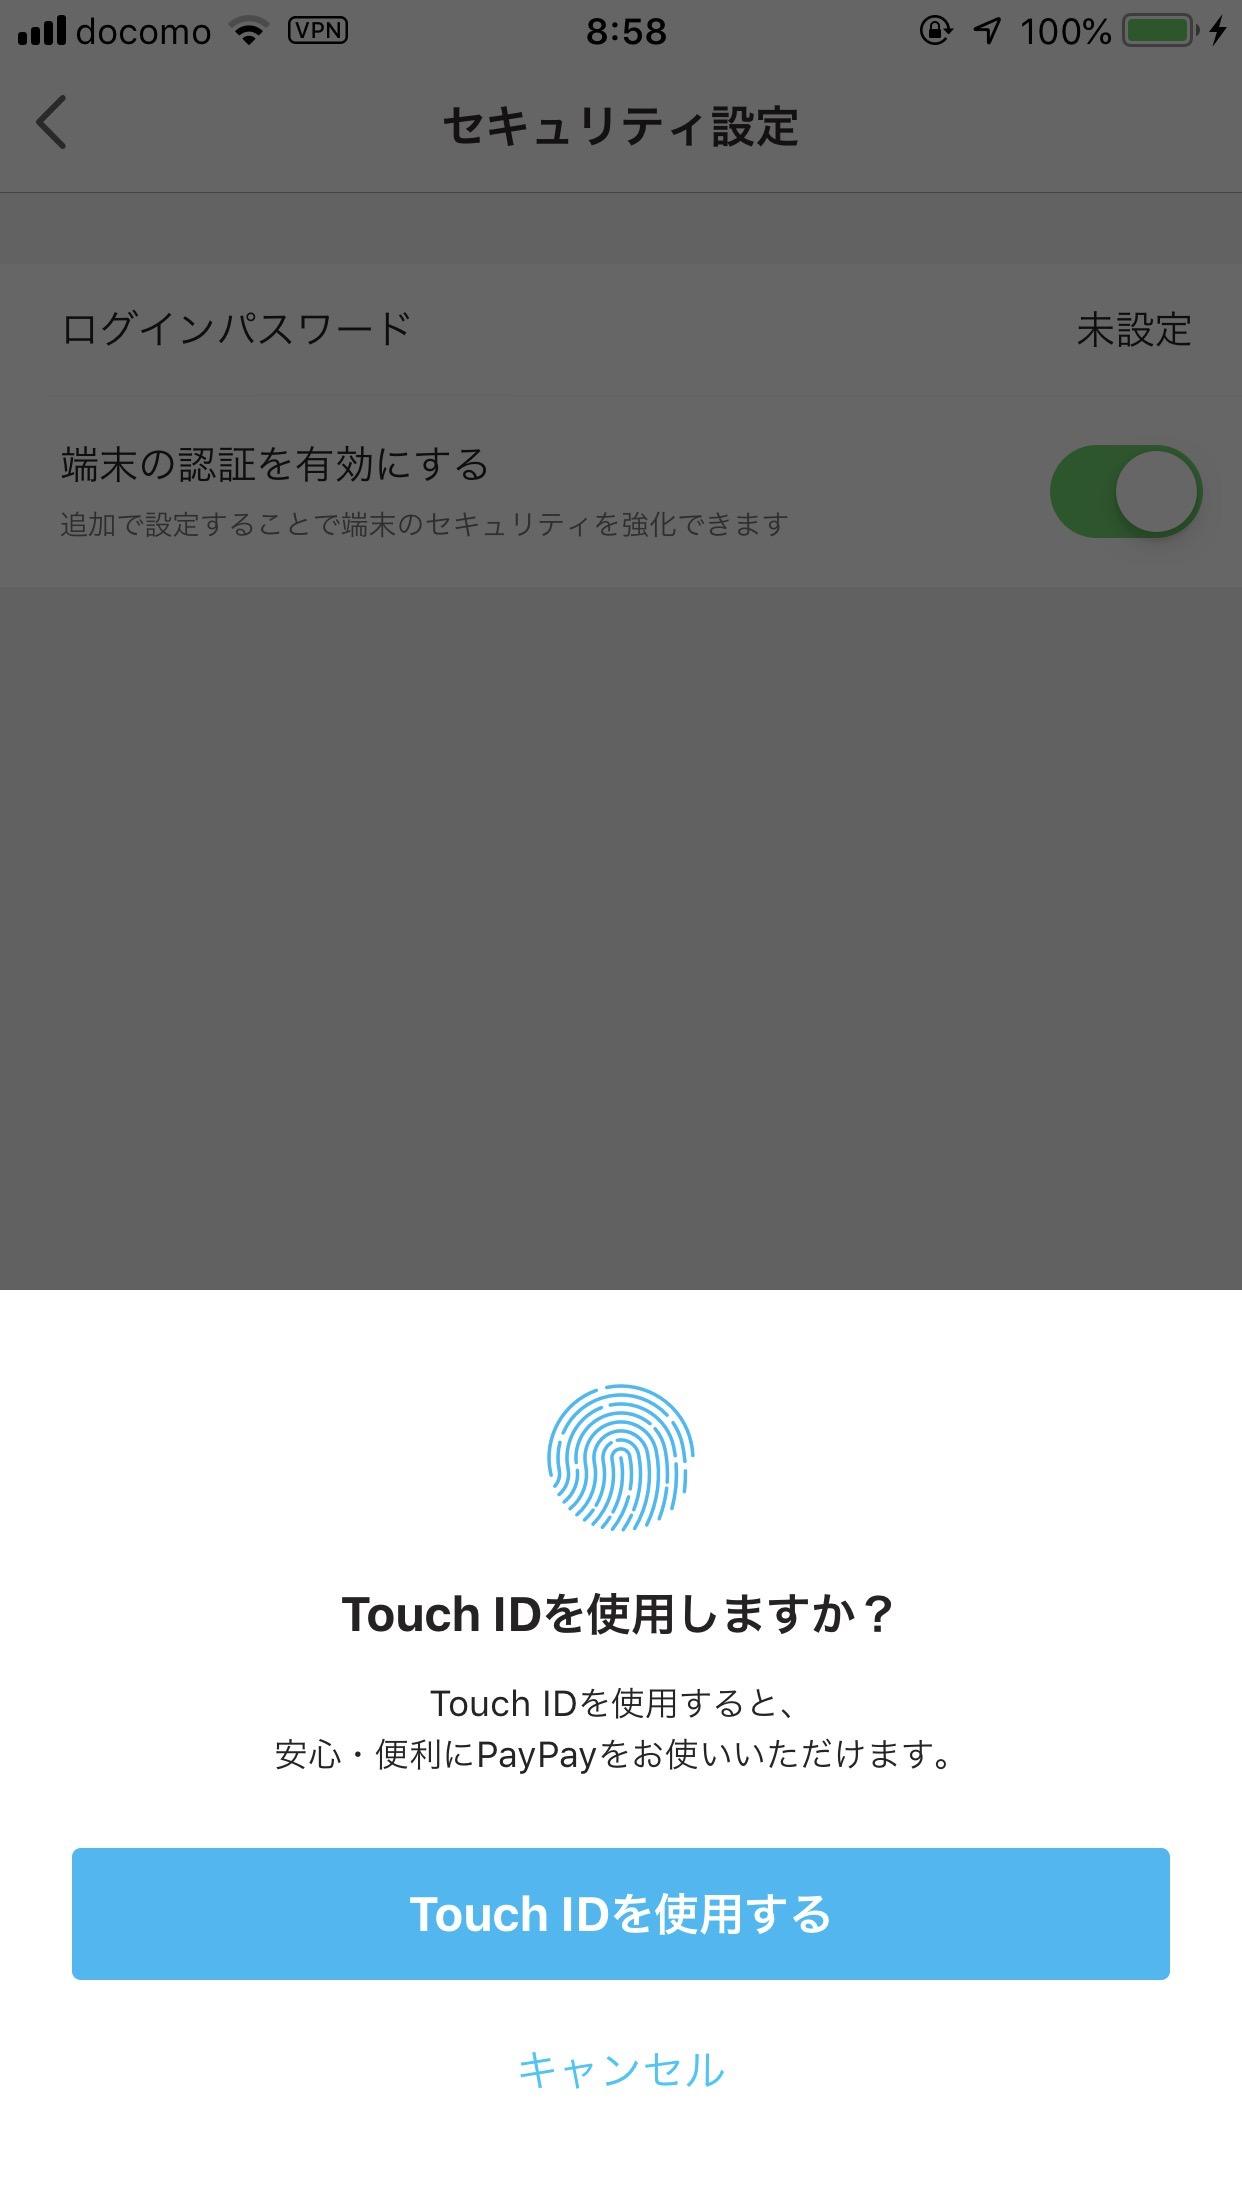 【PayPay】パスワードを変更する方法